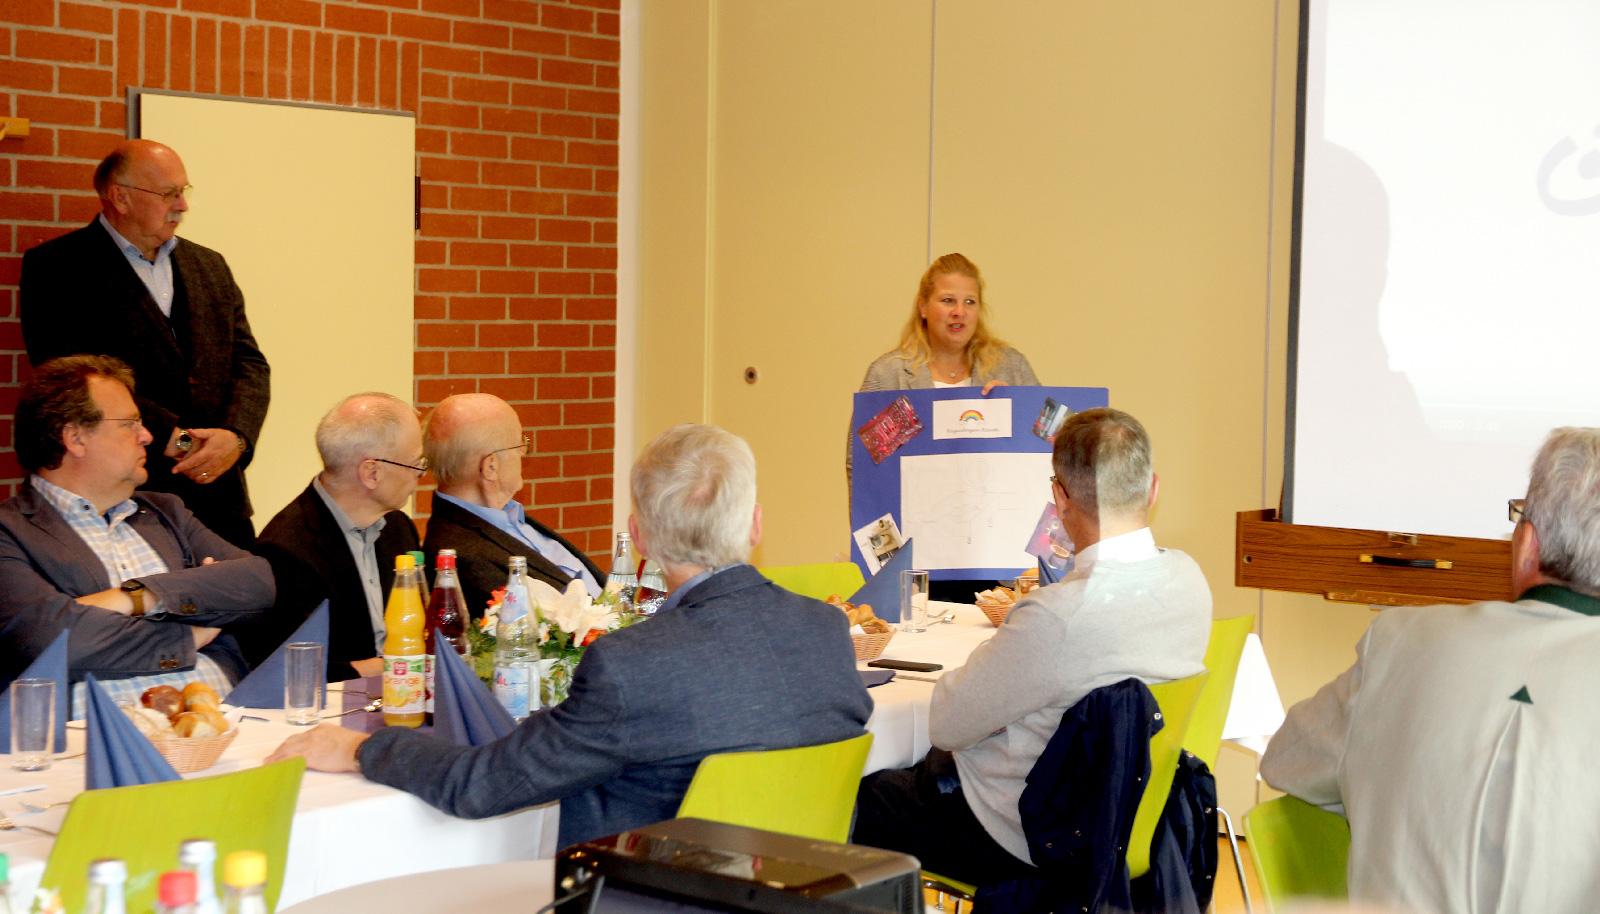 HPT-Leiterin Dilles erläutert Verwendungszweck. Spendengeld sei, so Rotary-Präsident Benk, gut angelegtes Geld.